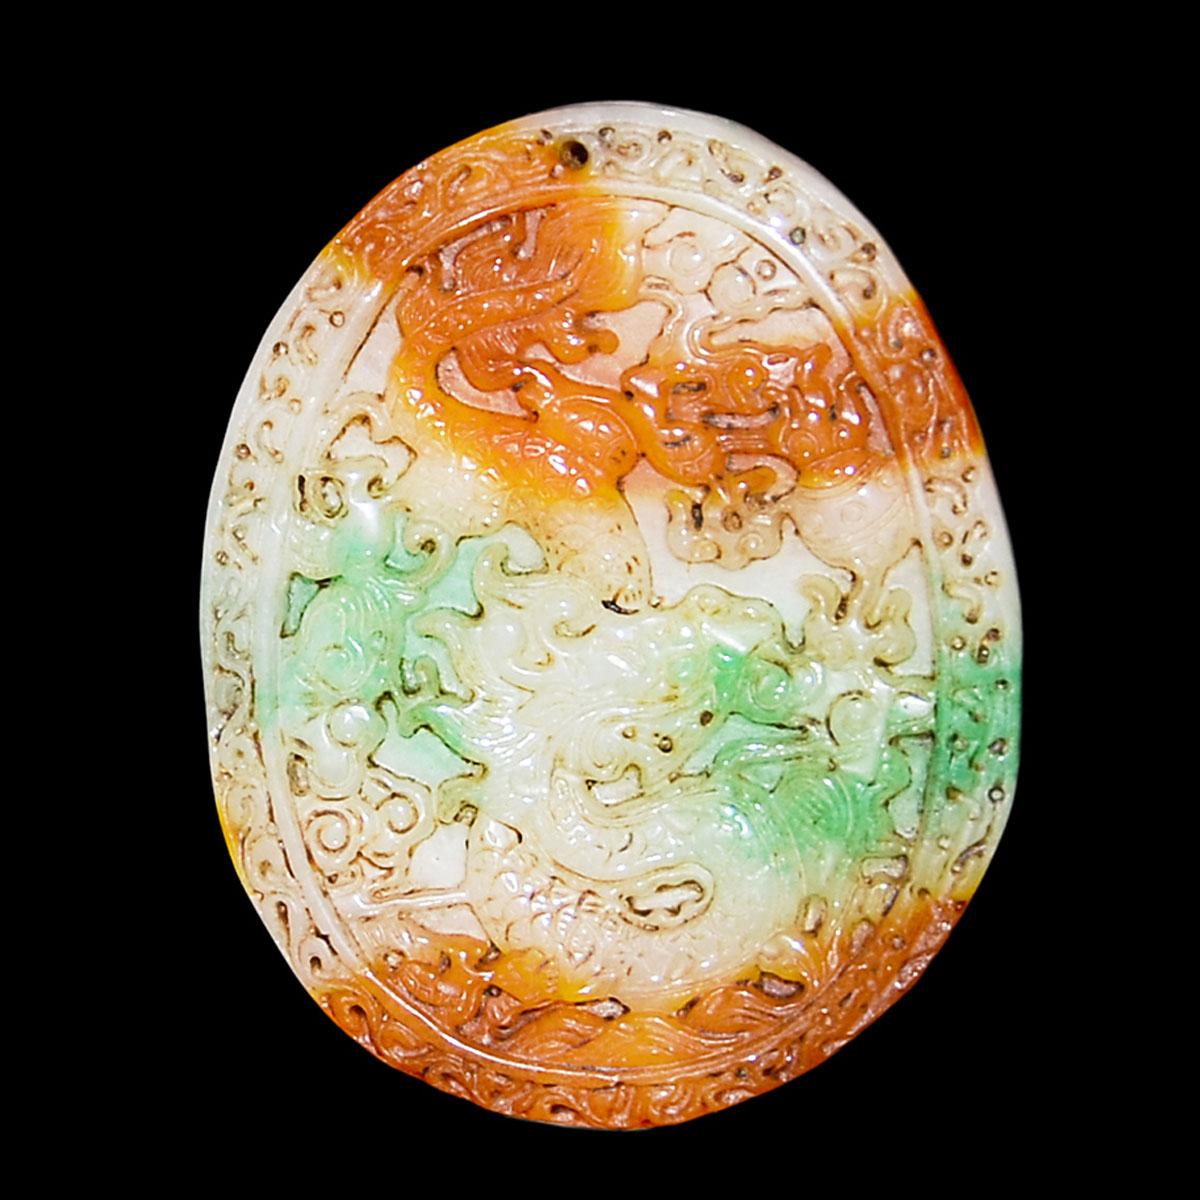 福祿壽三色冰種翡翠雙面雕龍鳳牡丹紋項飾 Glass Jadeite Tri-Color Pendant Pierced on Both Sides with Dragon-Phoenix and